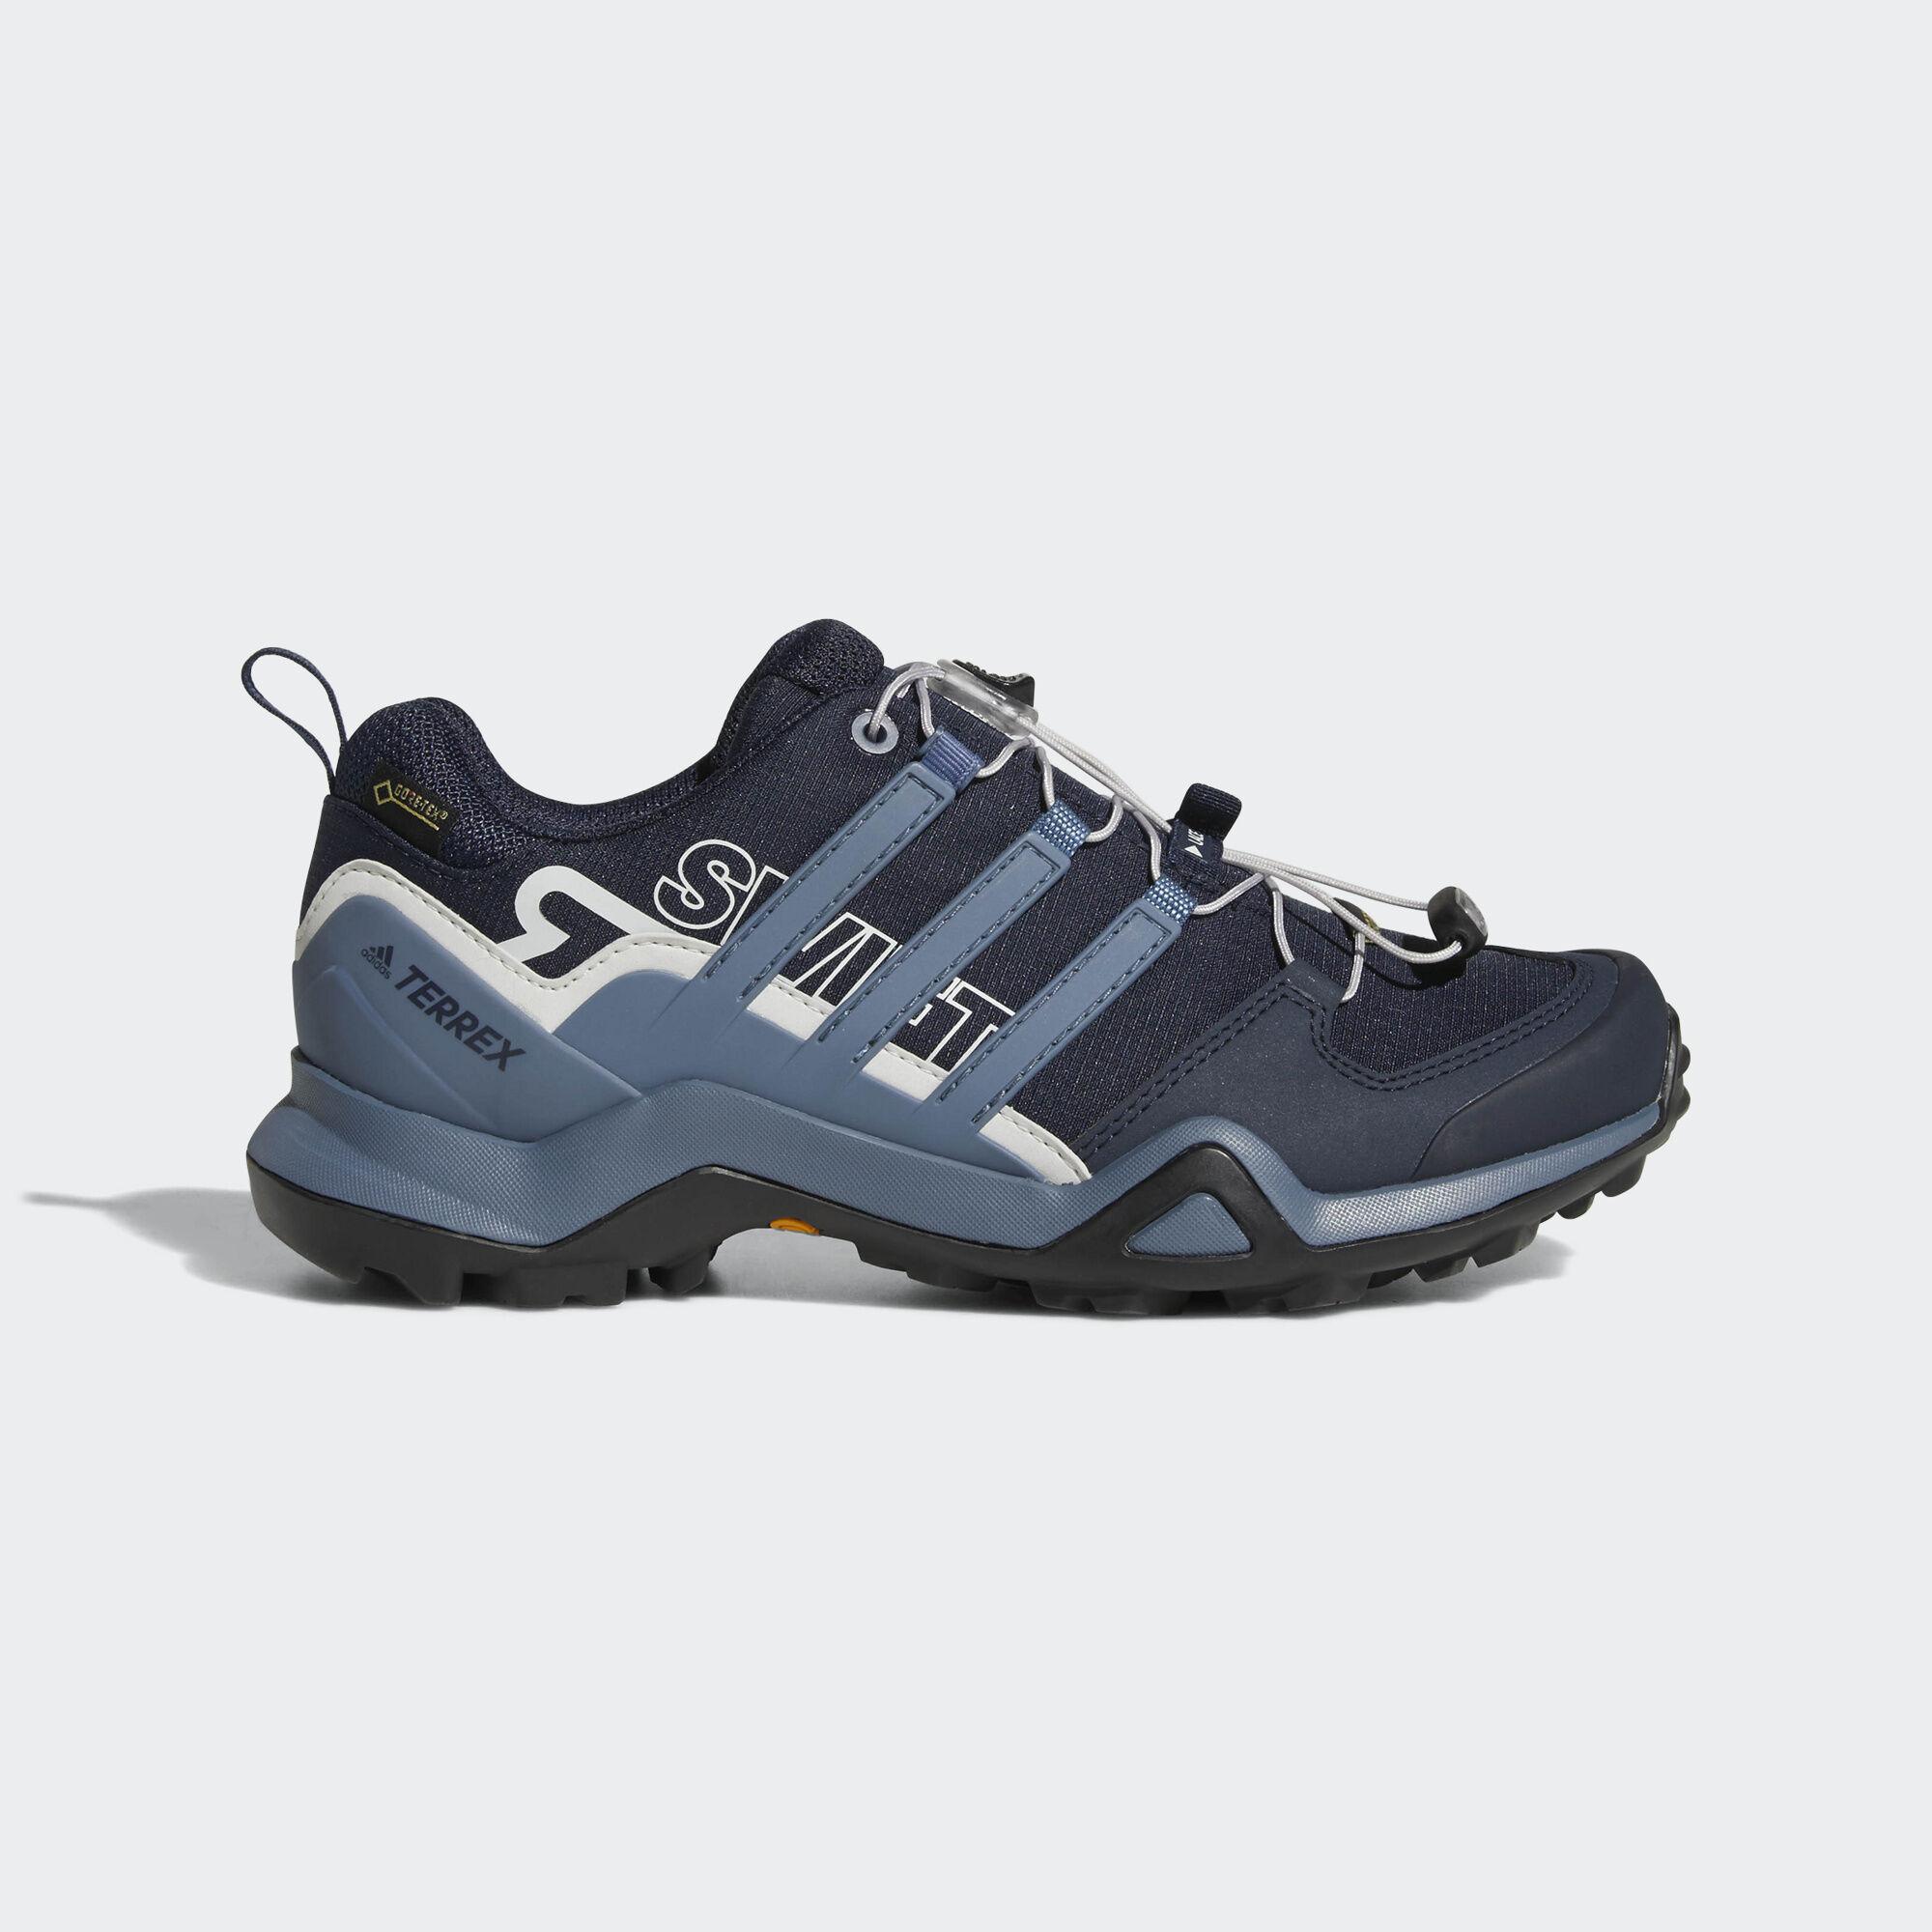 45a6eb71912 adidas - Terrex Swift R2 GTX Shoes Legend Ink   Tech Ink   Grey One AC8057. Women  TERREX